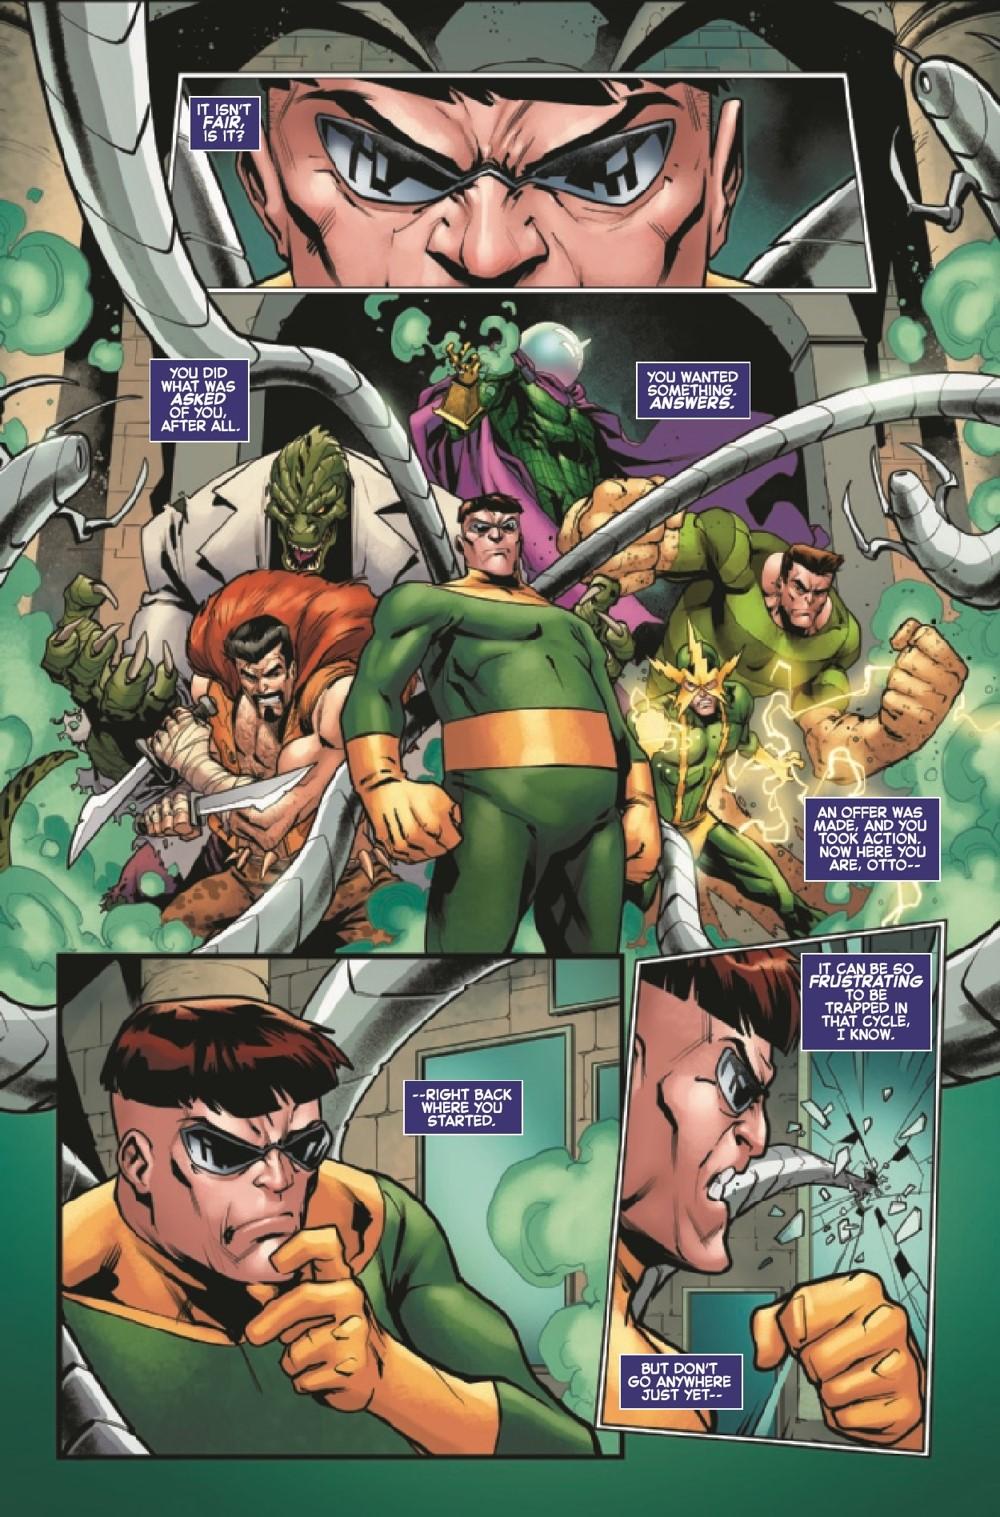 SINISTERWAR2021002_Preview-3 ComicList Previews: SINISTER WAR #2 (OF 4)